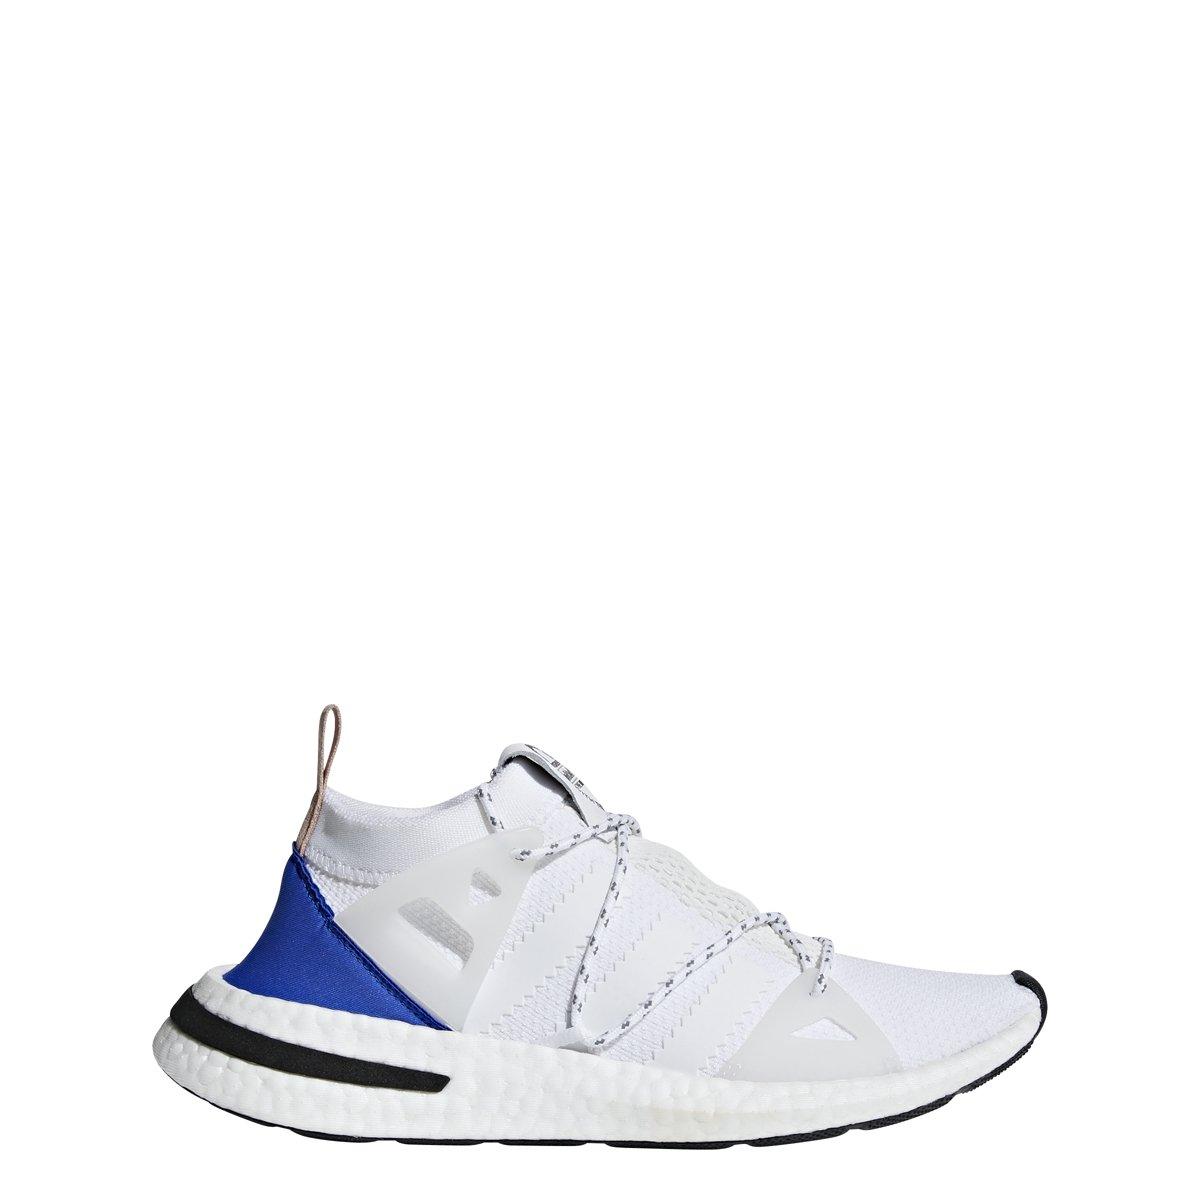   adidas Originals Arkyn Runner Women's White